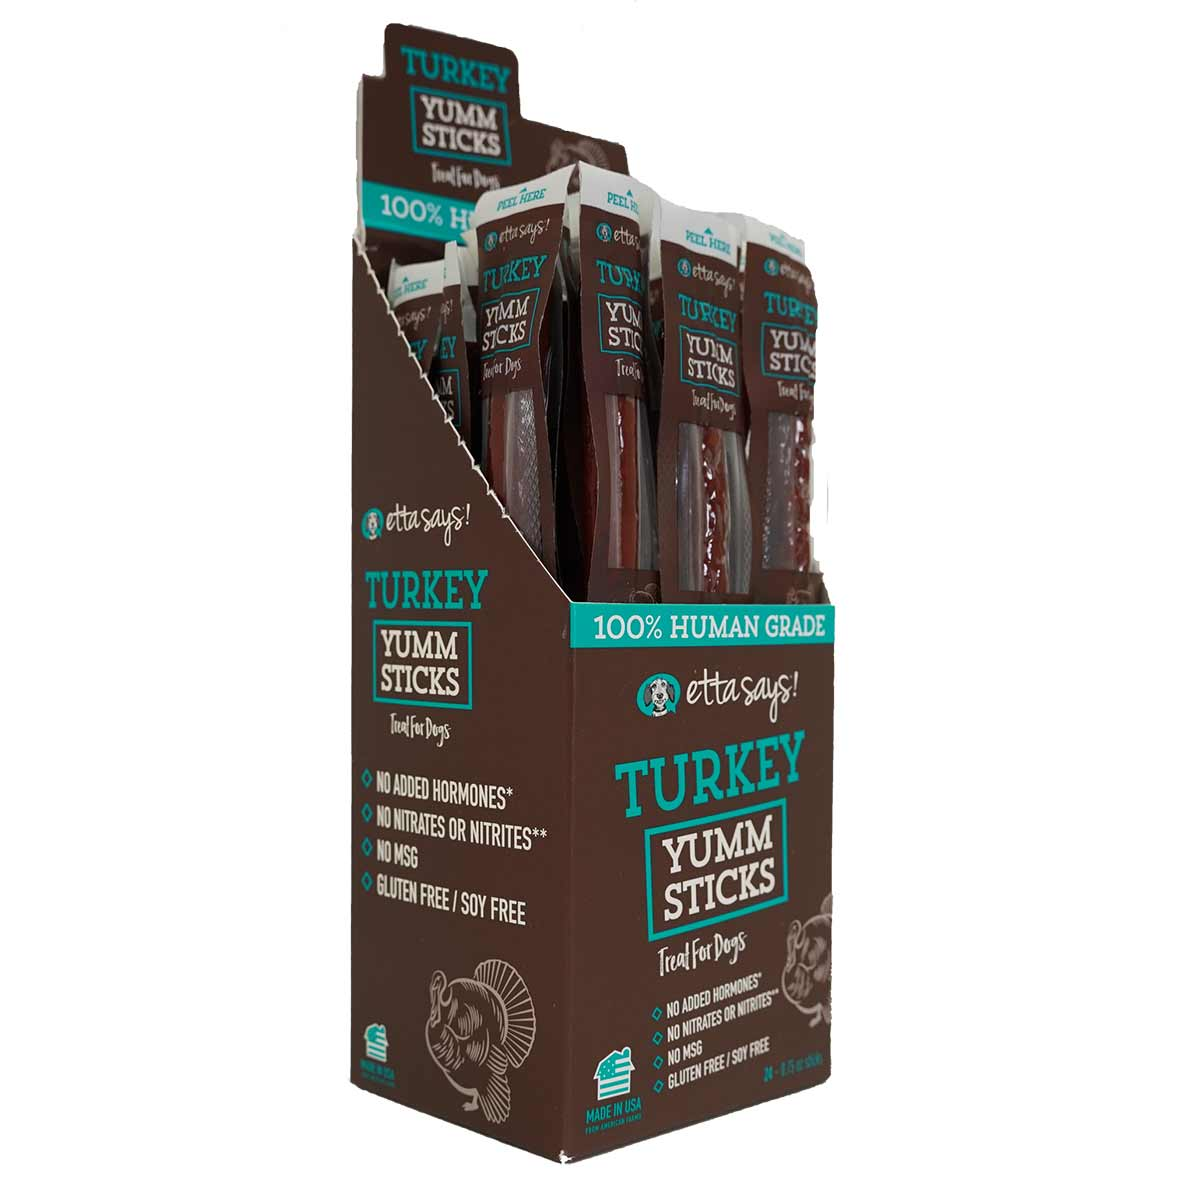 Bulk Dog Treats Etta Says Yuum Sticks Turkey Display Box 24 Count